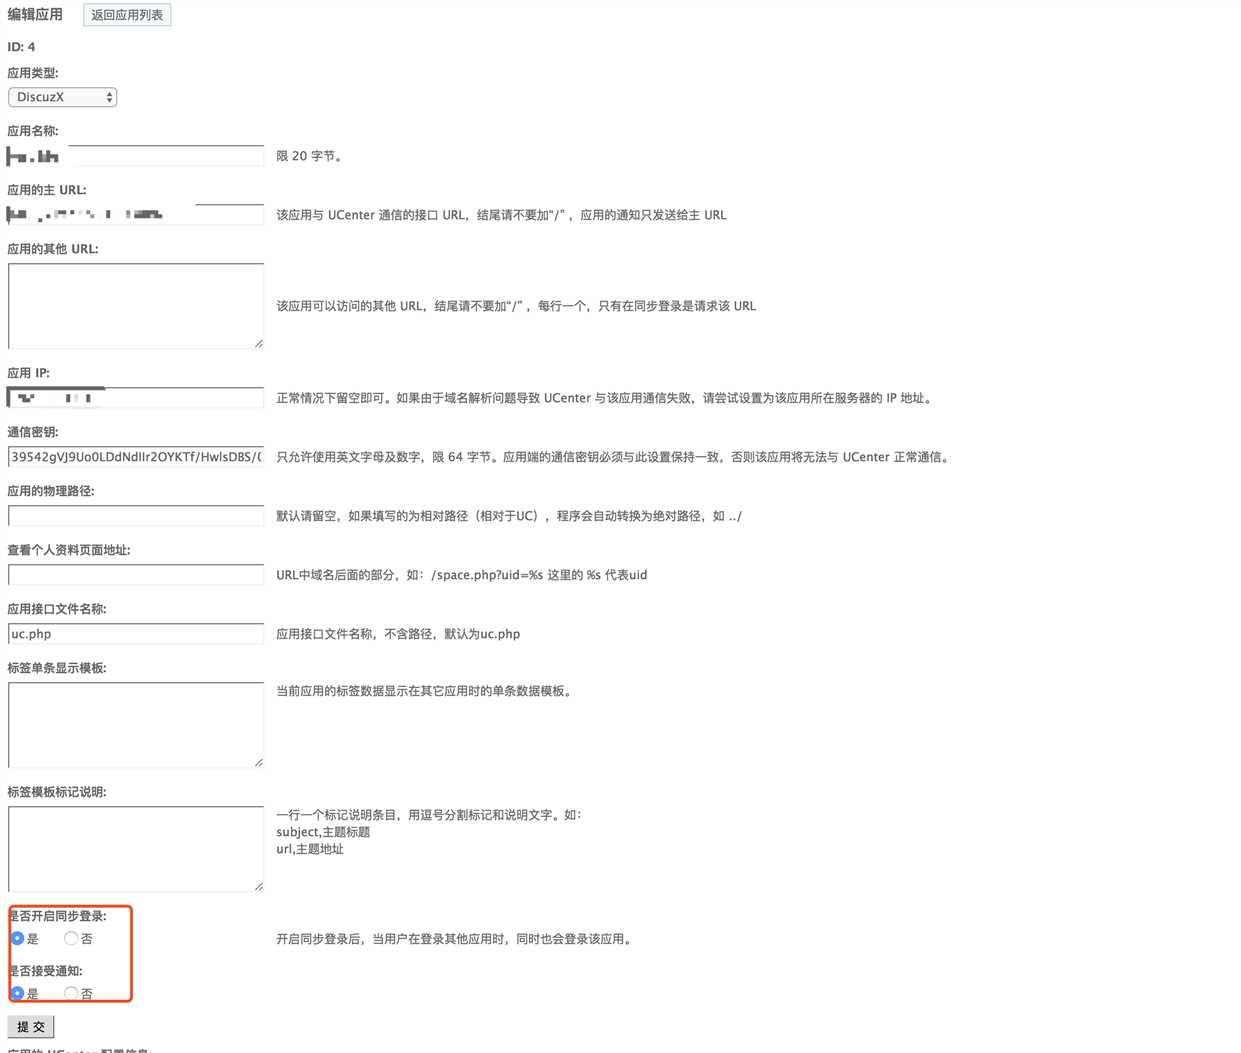 ucjava通用版下载_通用财会软件工会70版下载_通用串行总线控制器的下载win7版